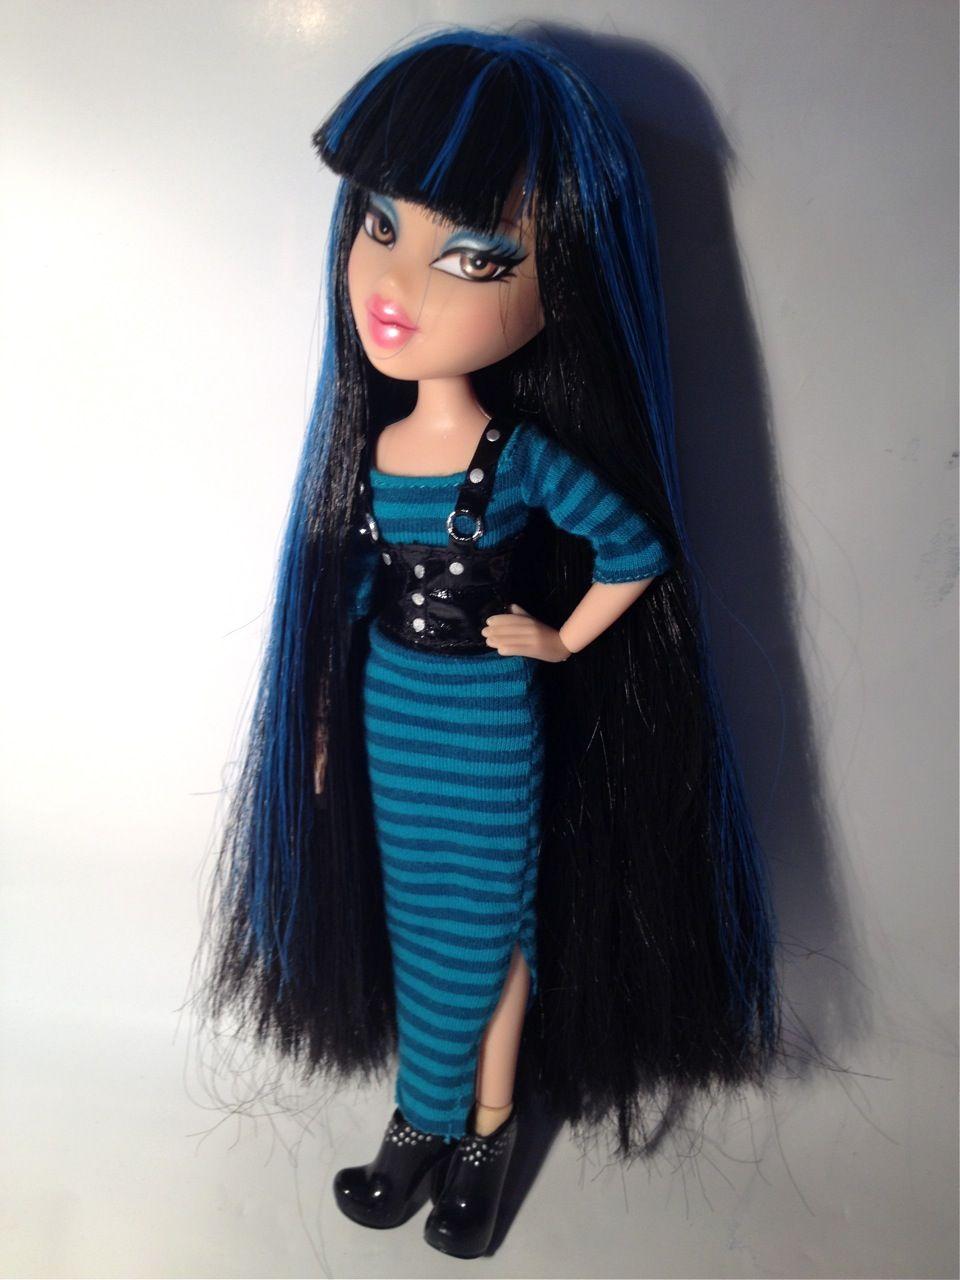 Featherageous Jade Not Actually Articulated Bratz Doll Beauty Dolls